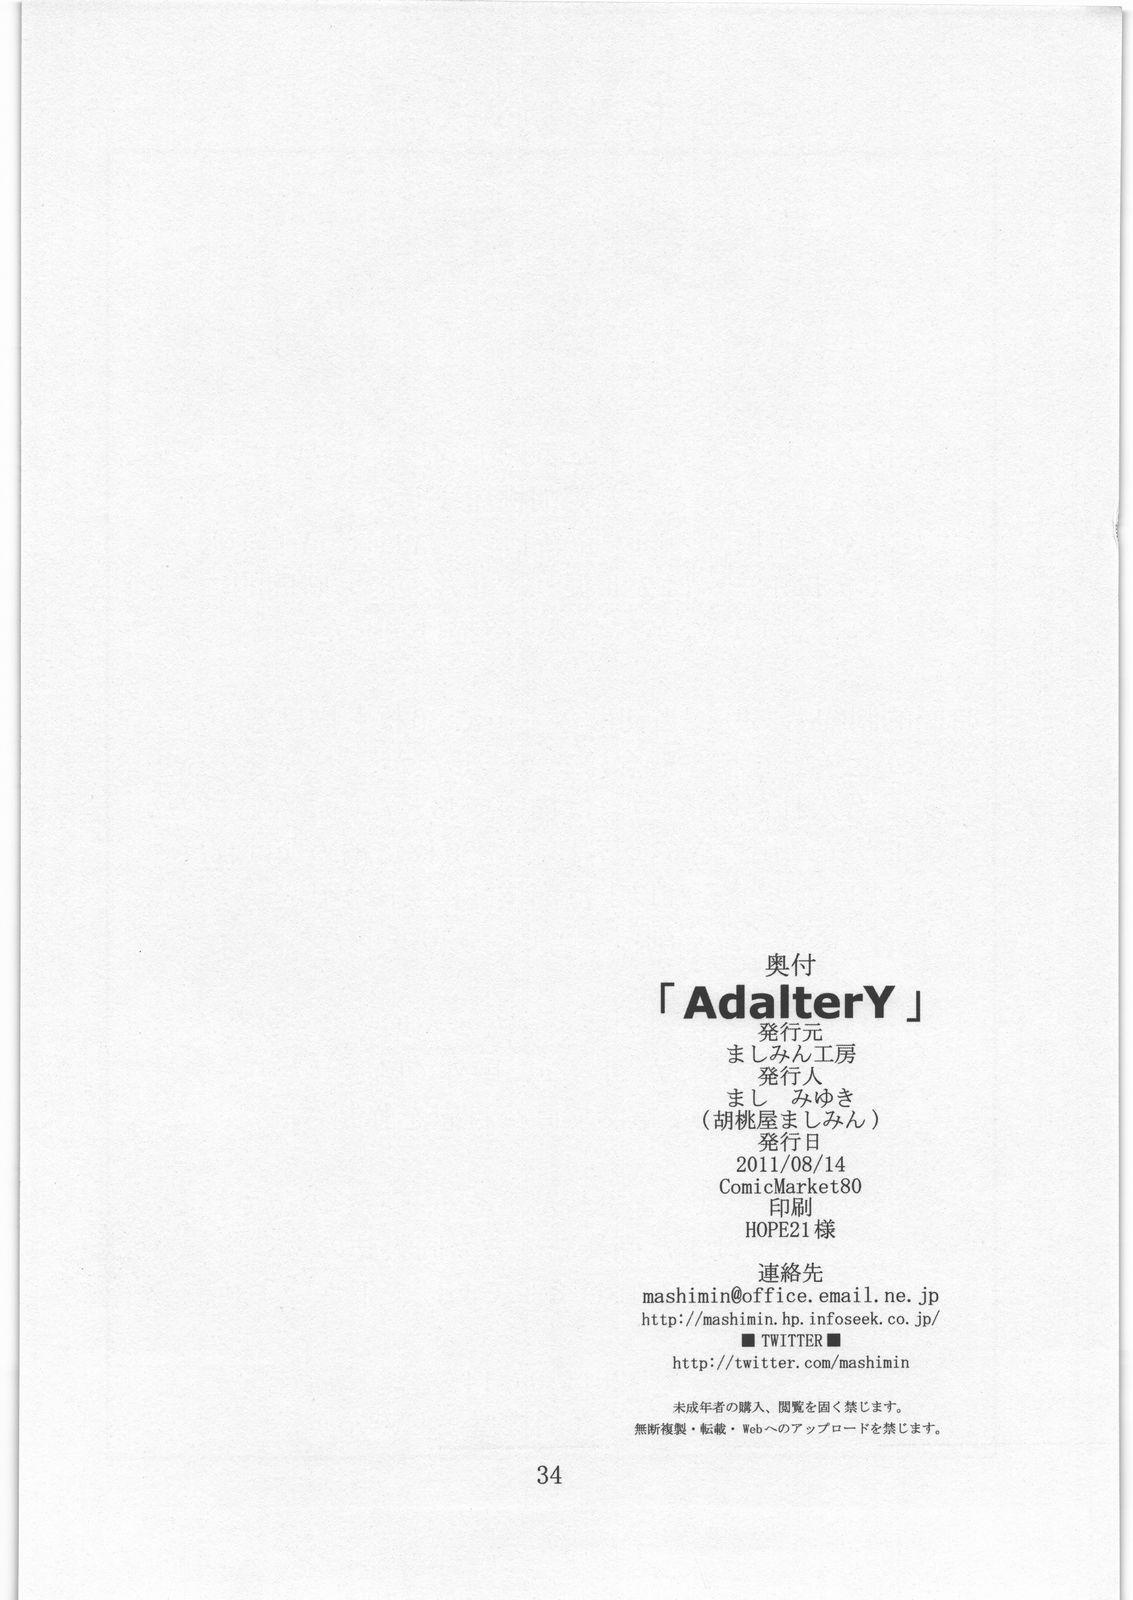 AdalterY 32